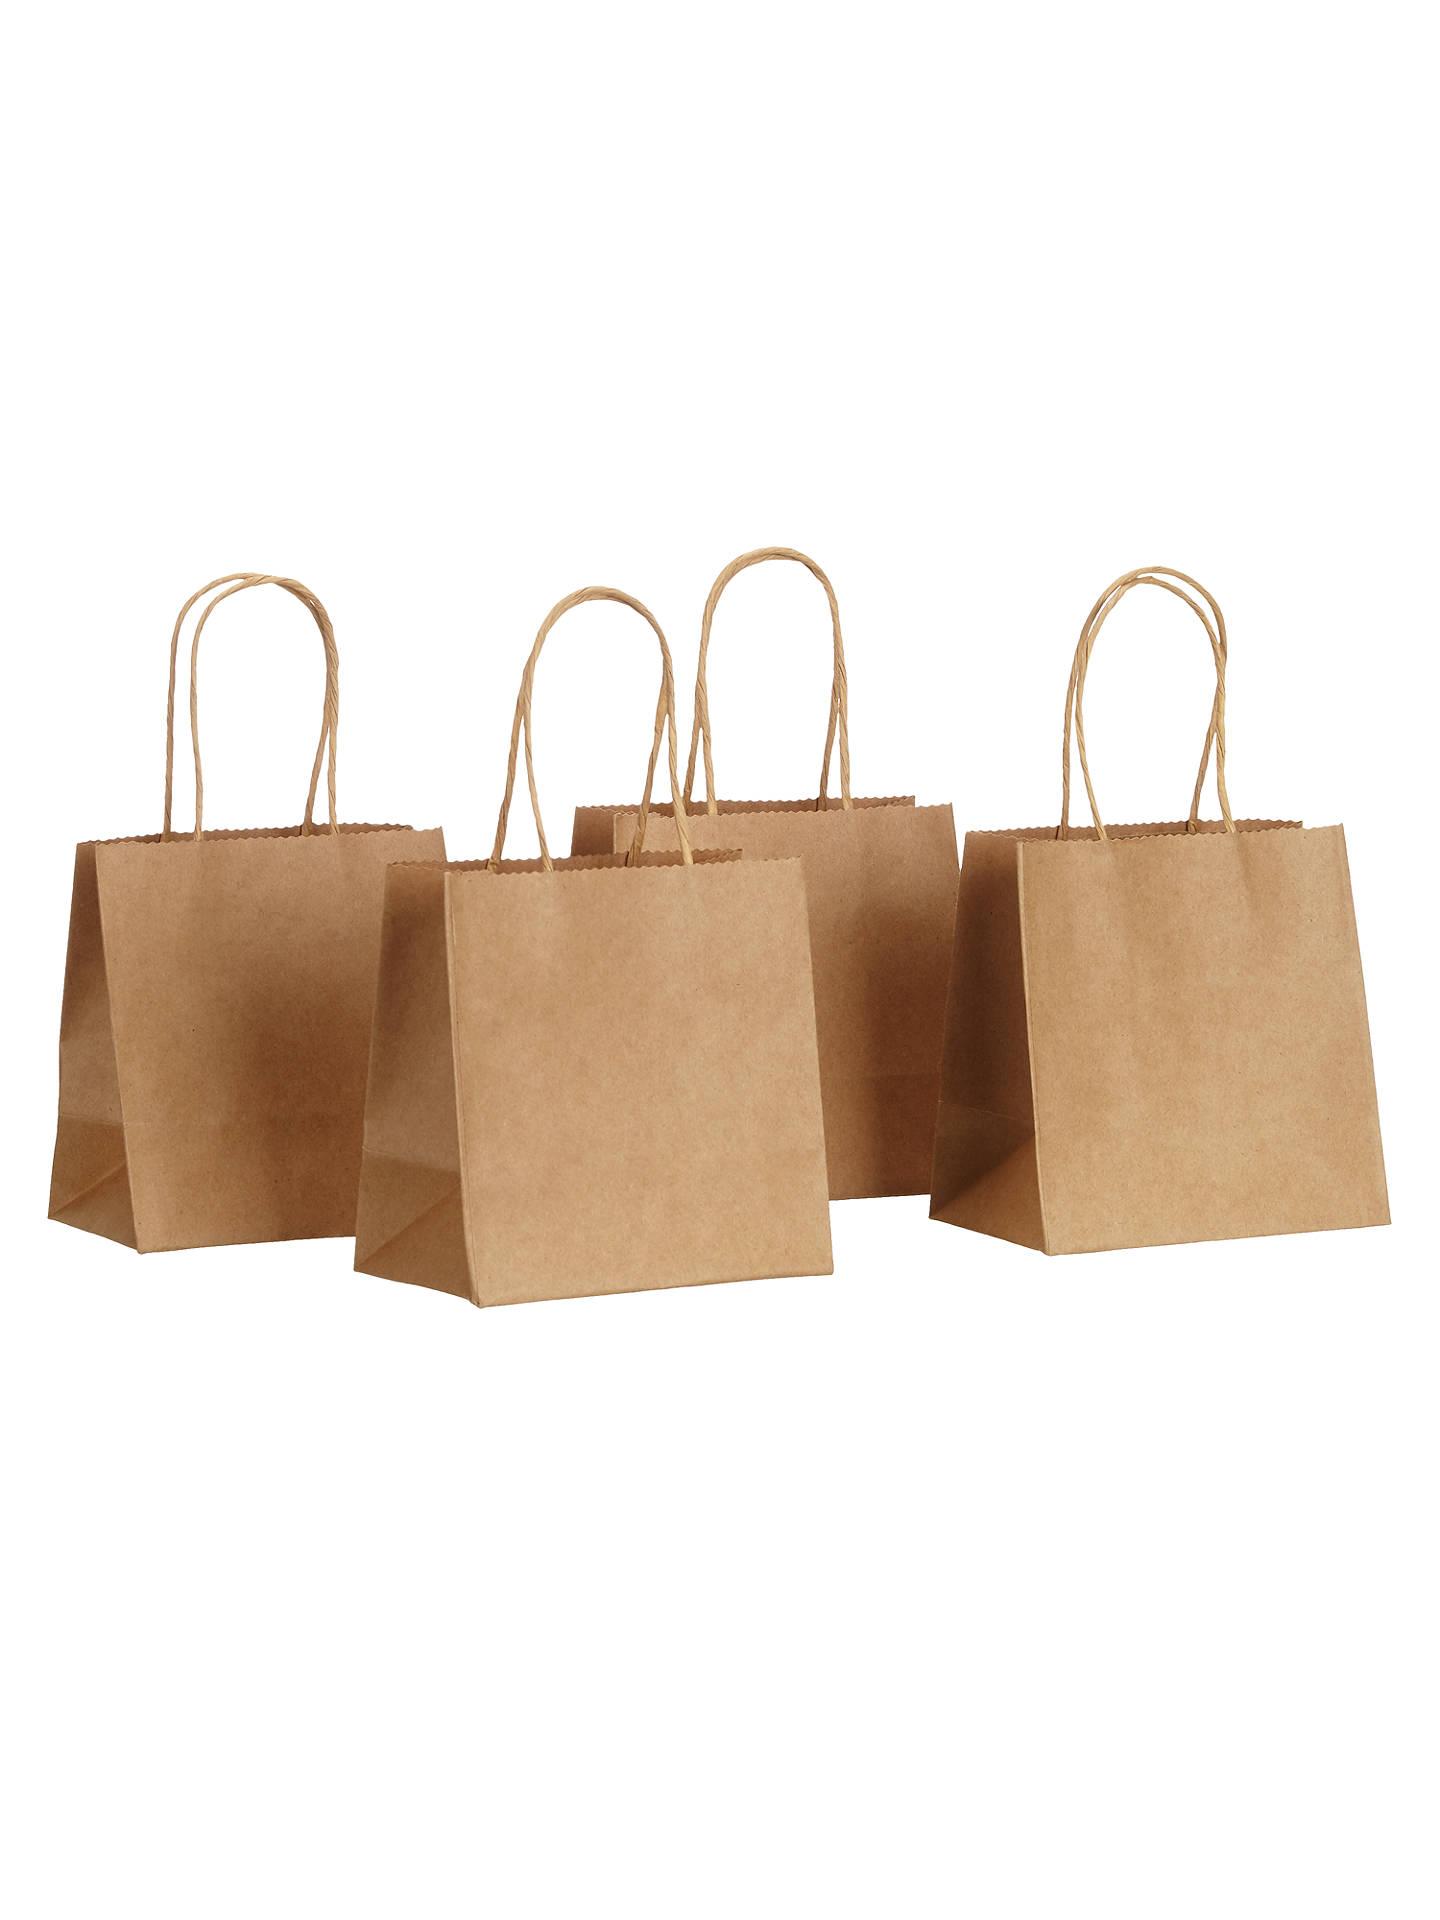 John Lewis Partners Mini Paper Gift Bags Pack Of 4 Brown Online At